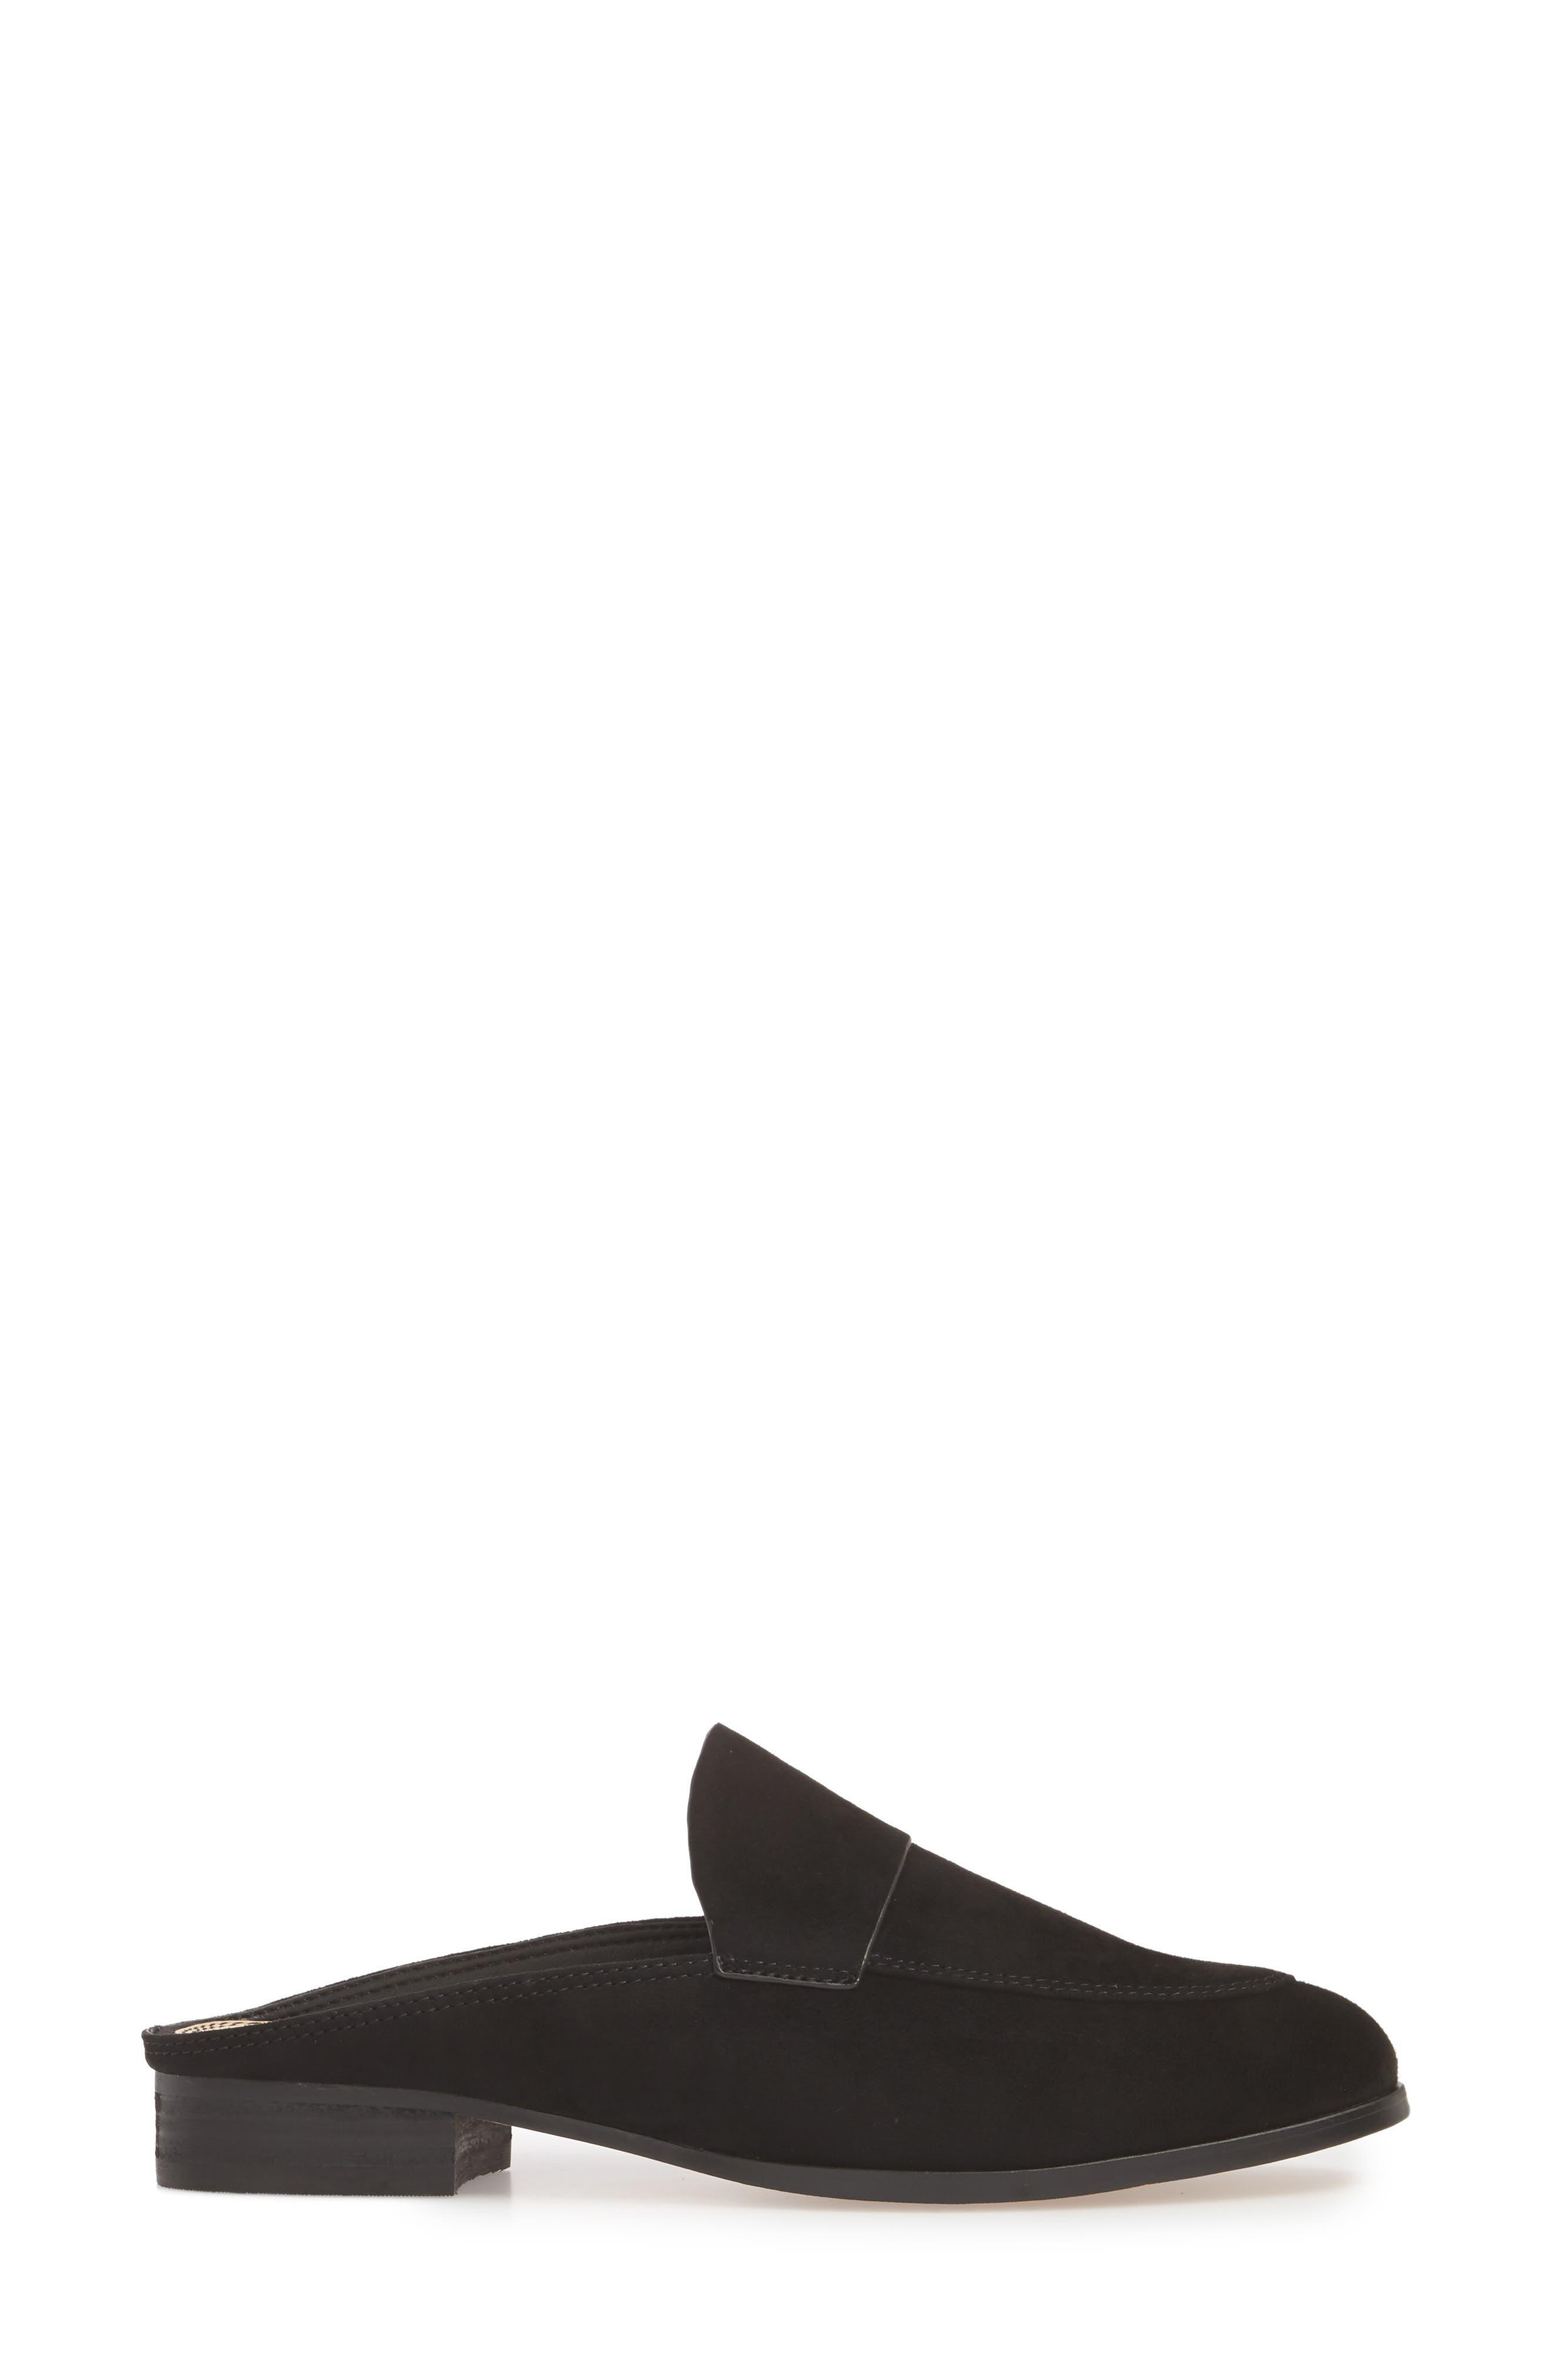 Nima Loafer Mule,                             Alternate thumbnail 6, color,                             Black Suede